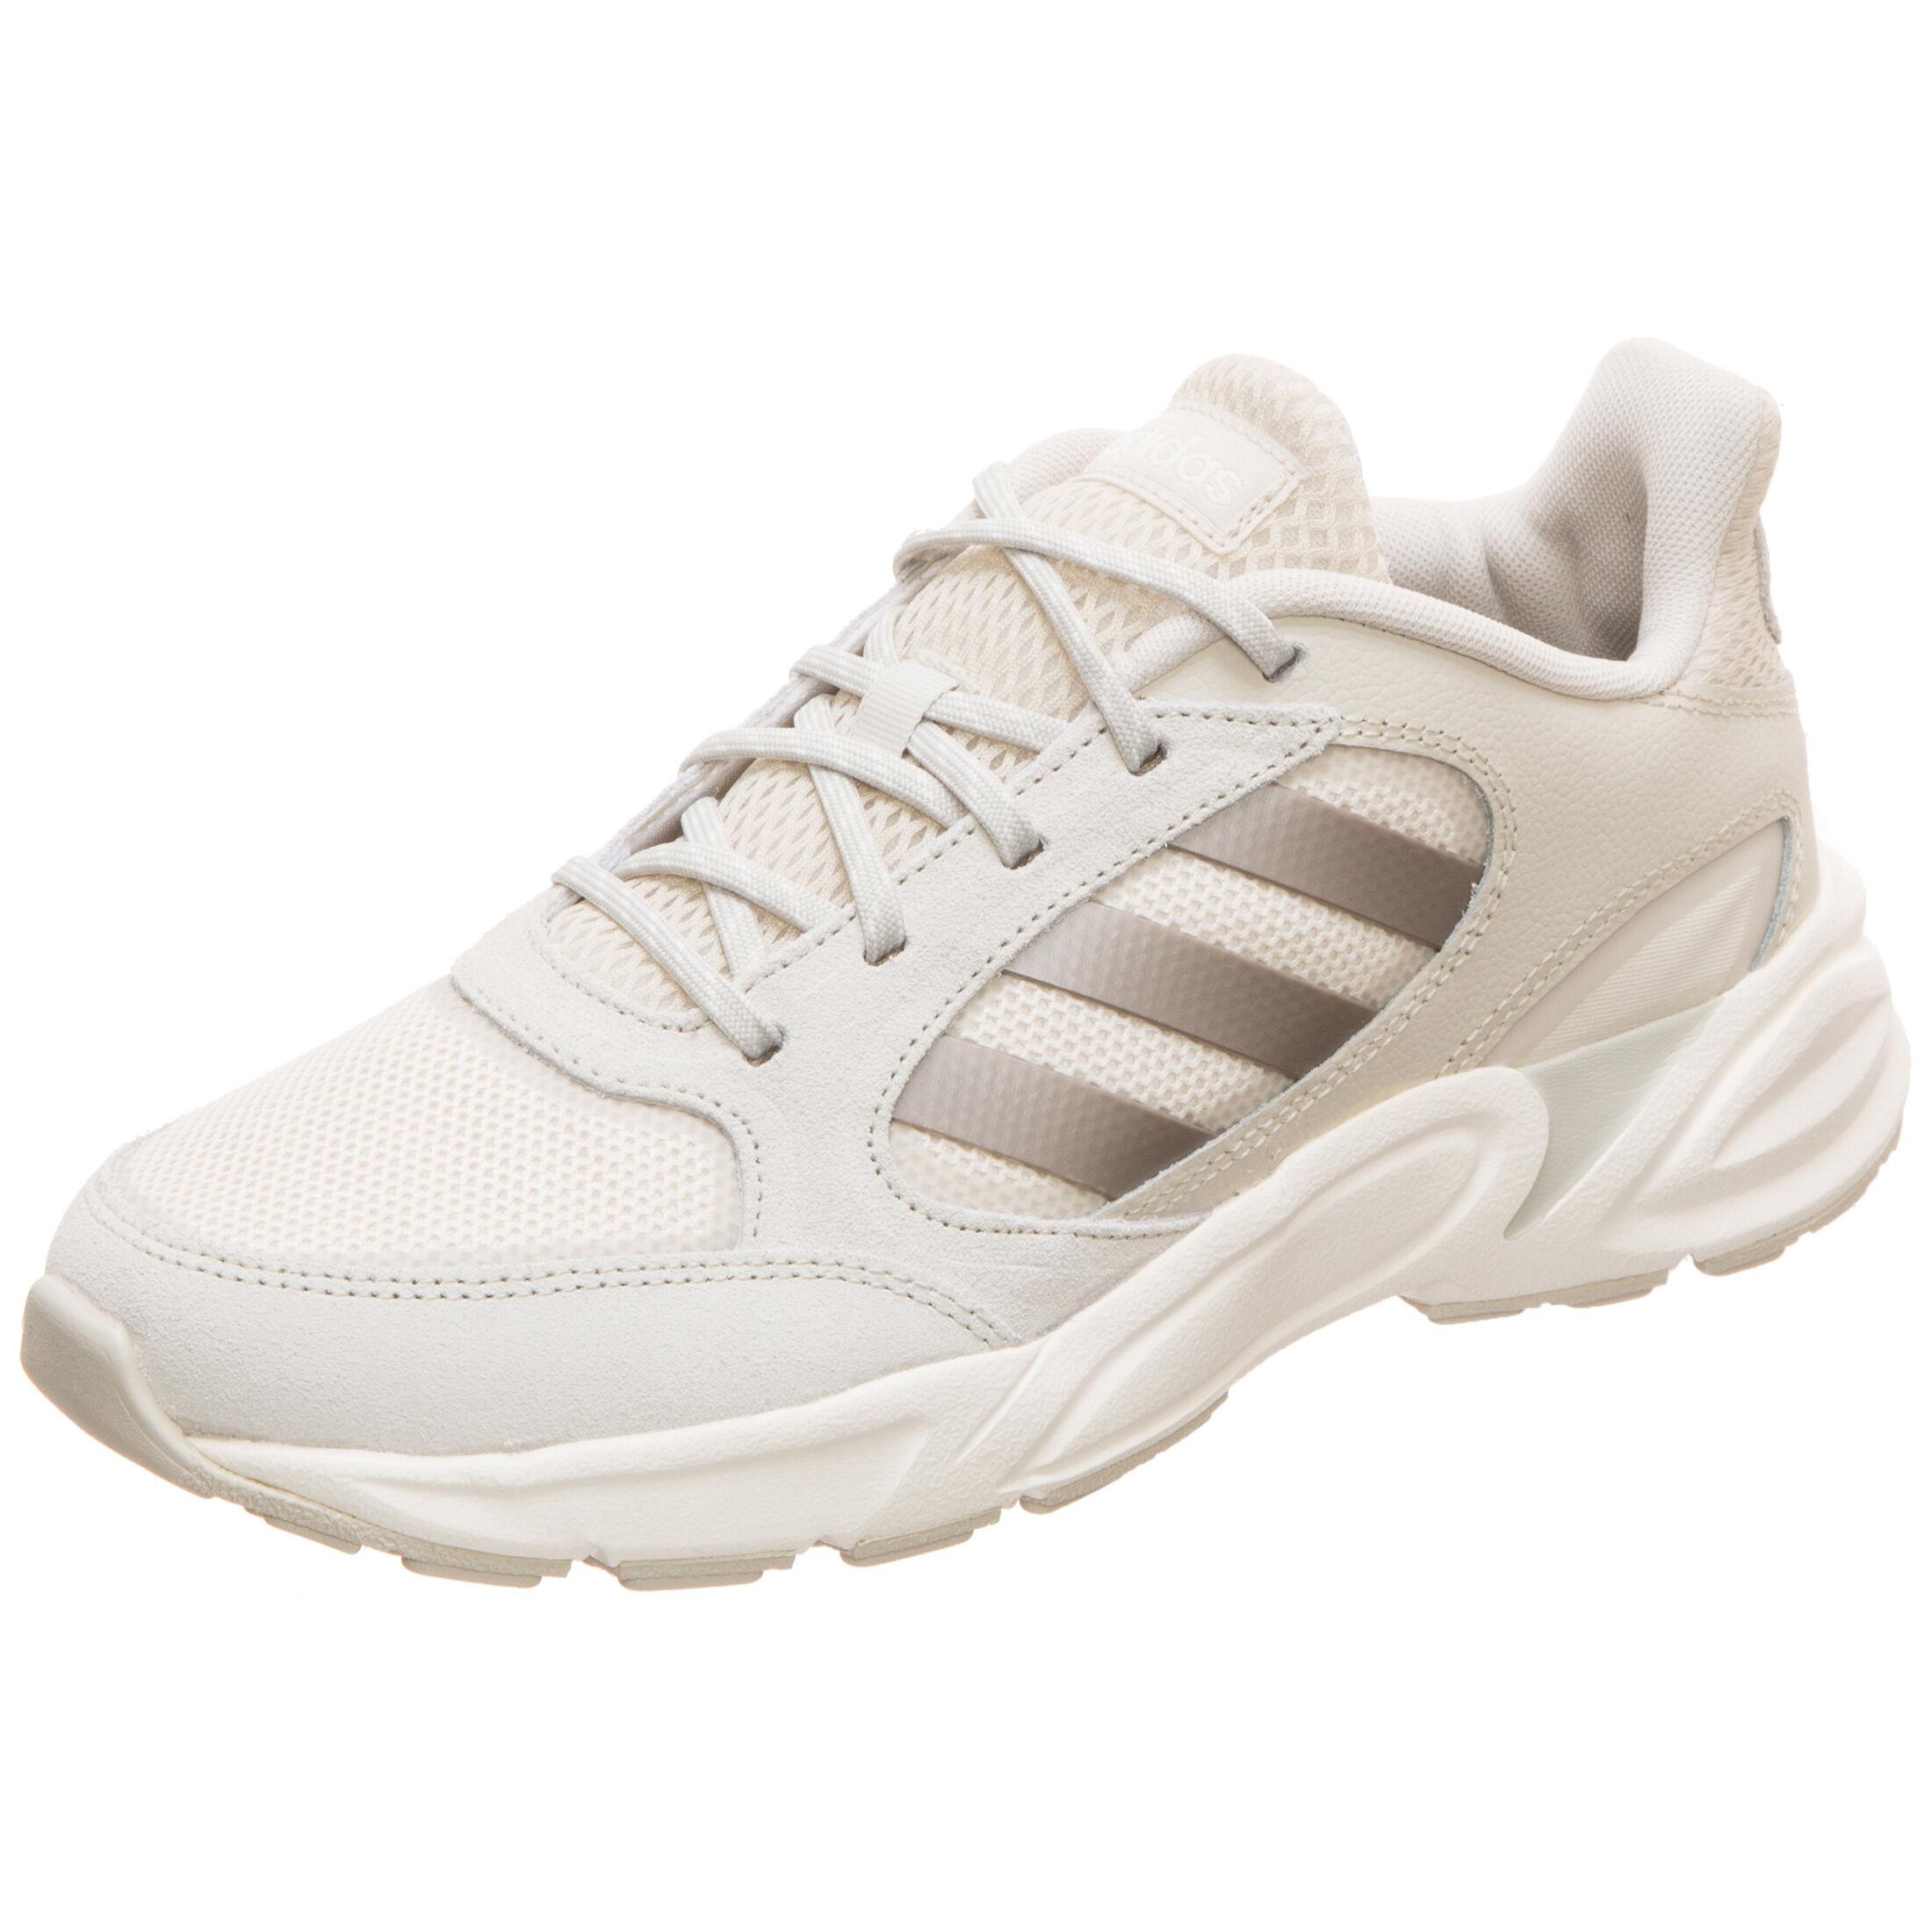 Bei Outfitter Adidasfrauen Lifestyle Bei Schuhe Adidasfrauen